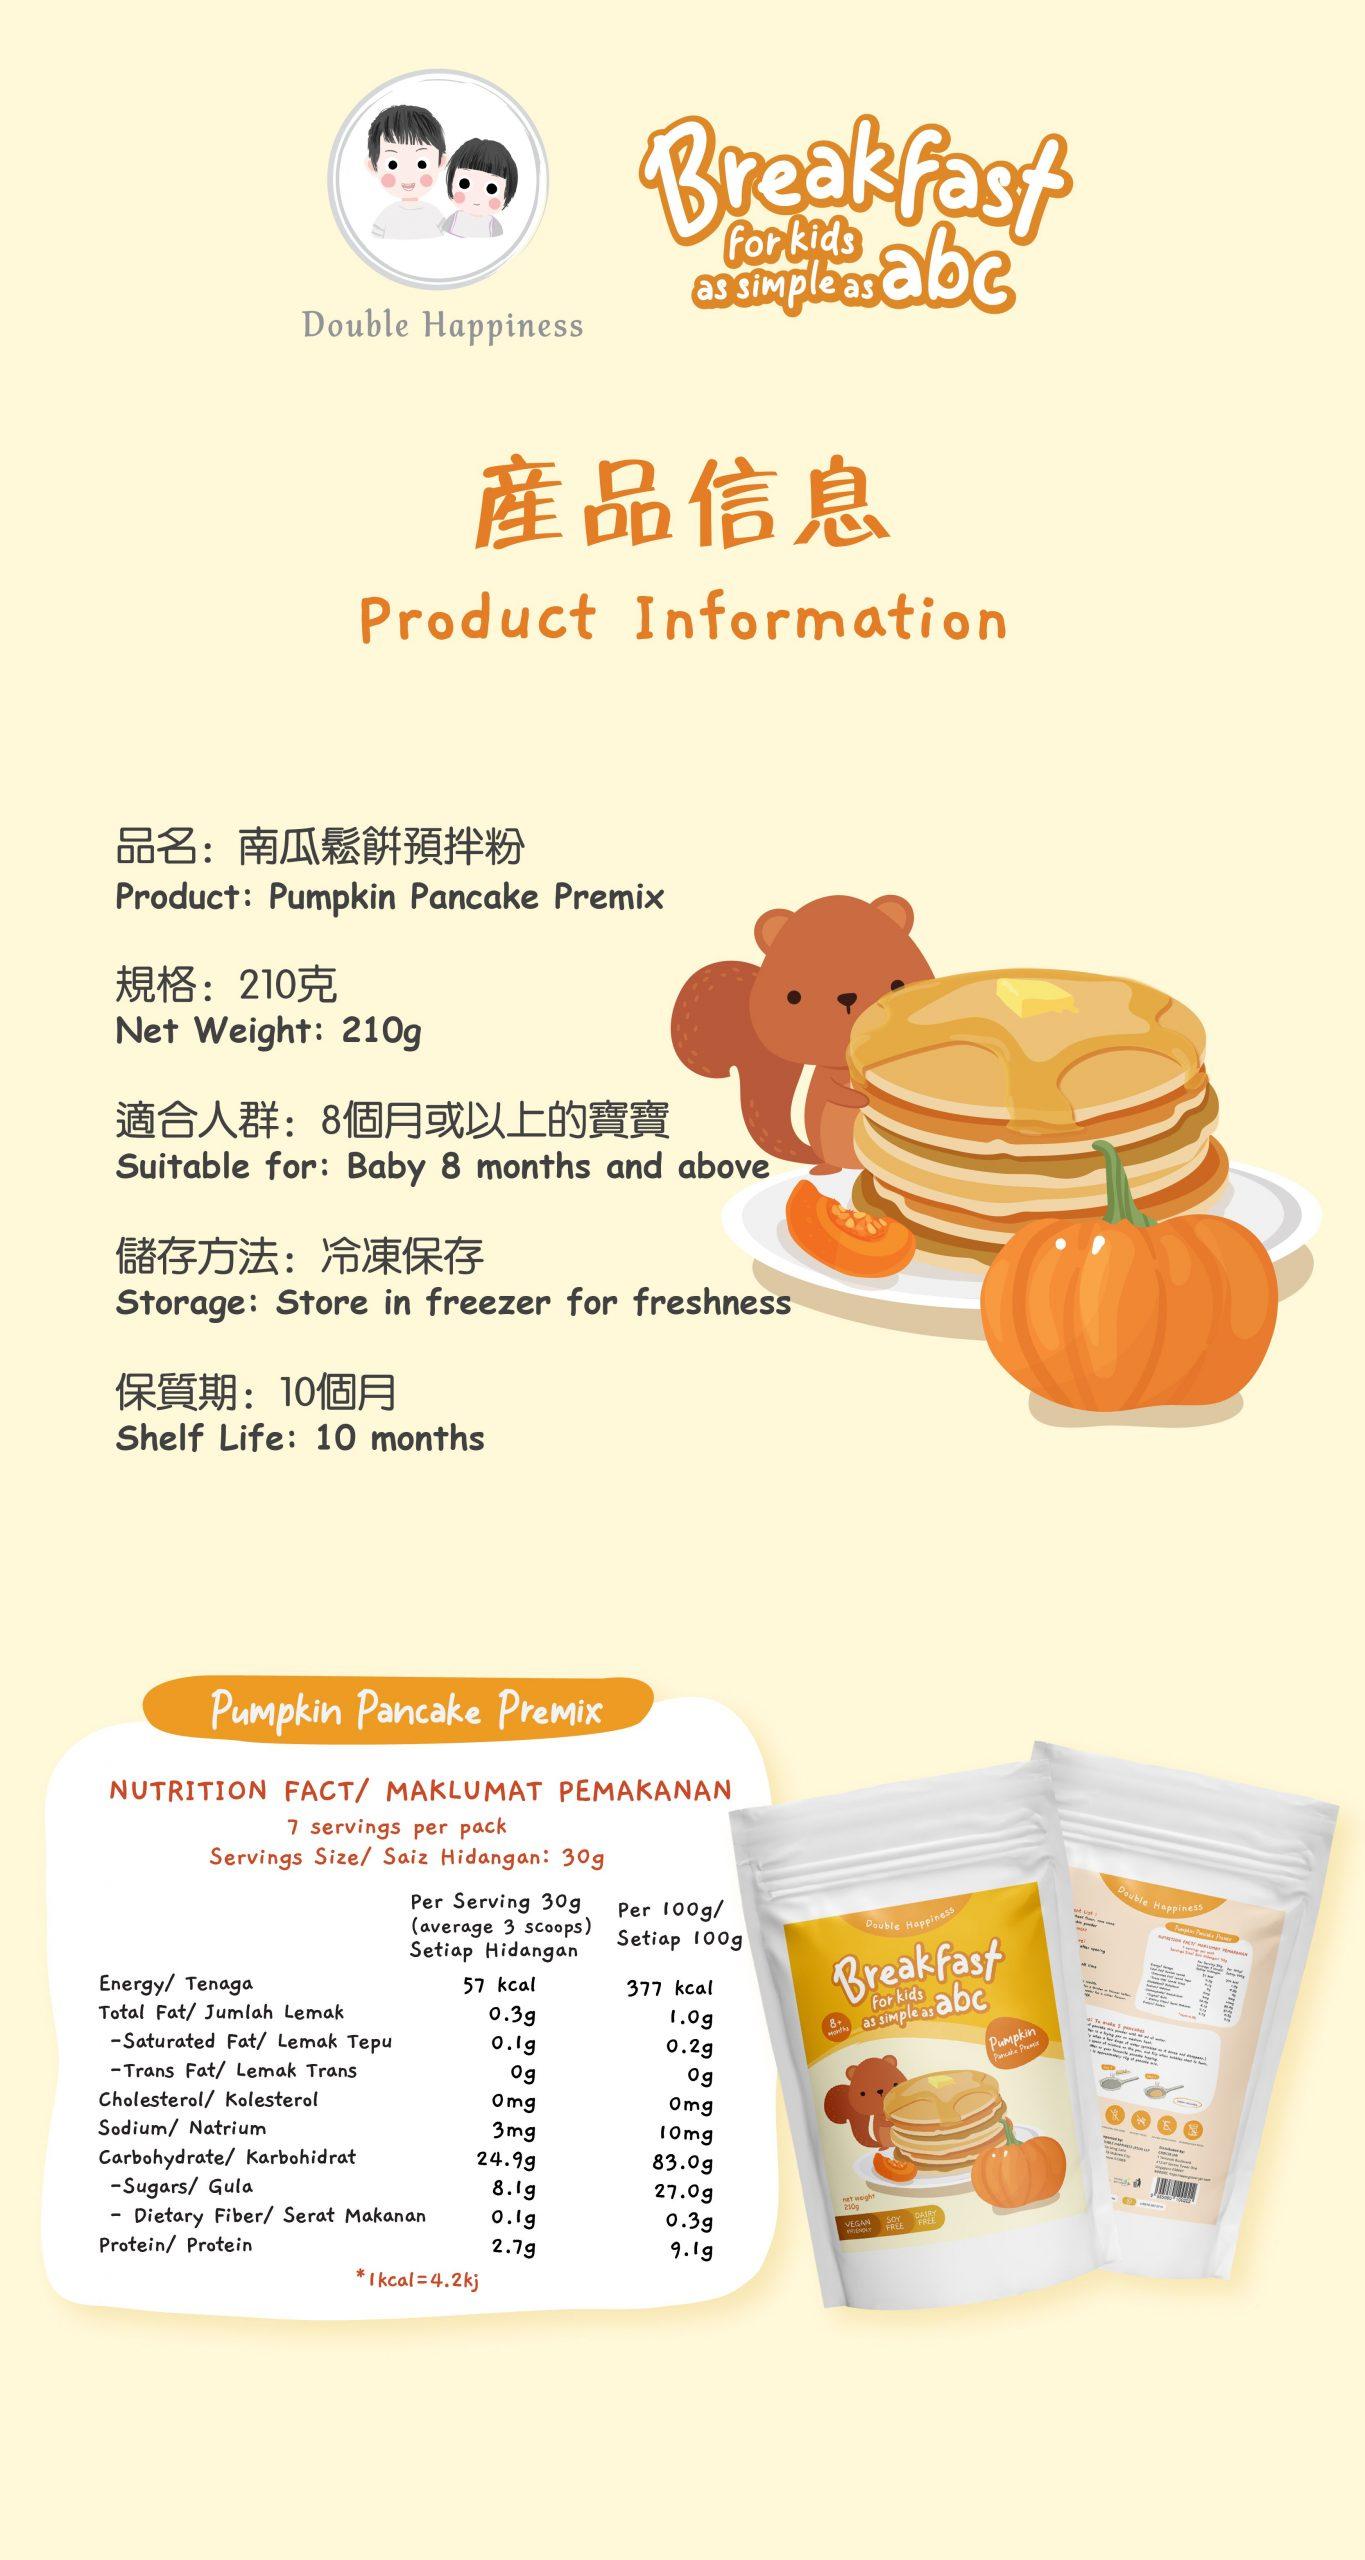 Pumpkin Pancake Premix product information